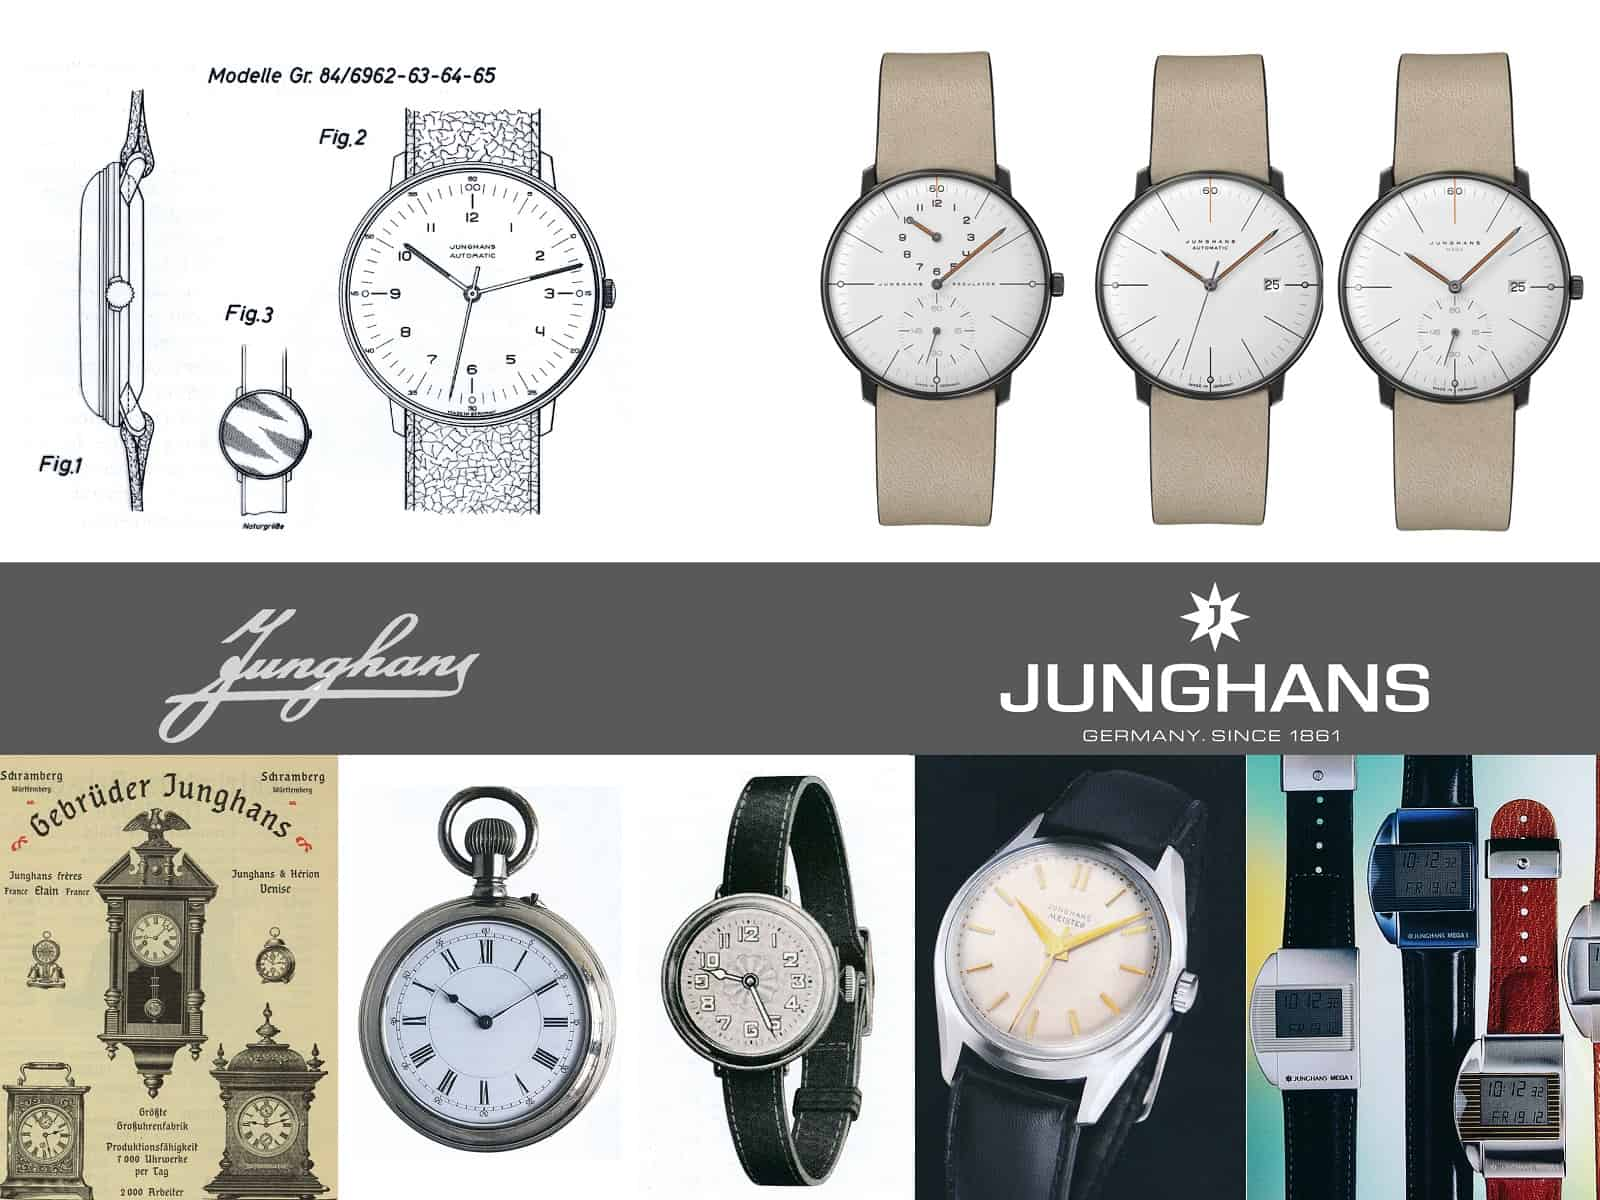 Junghans Uhren Geschichte 1861 bis max bill Edition Set 60